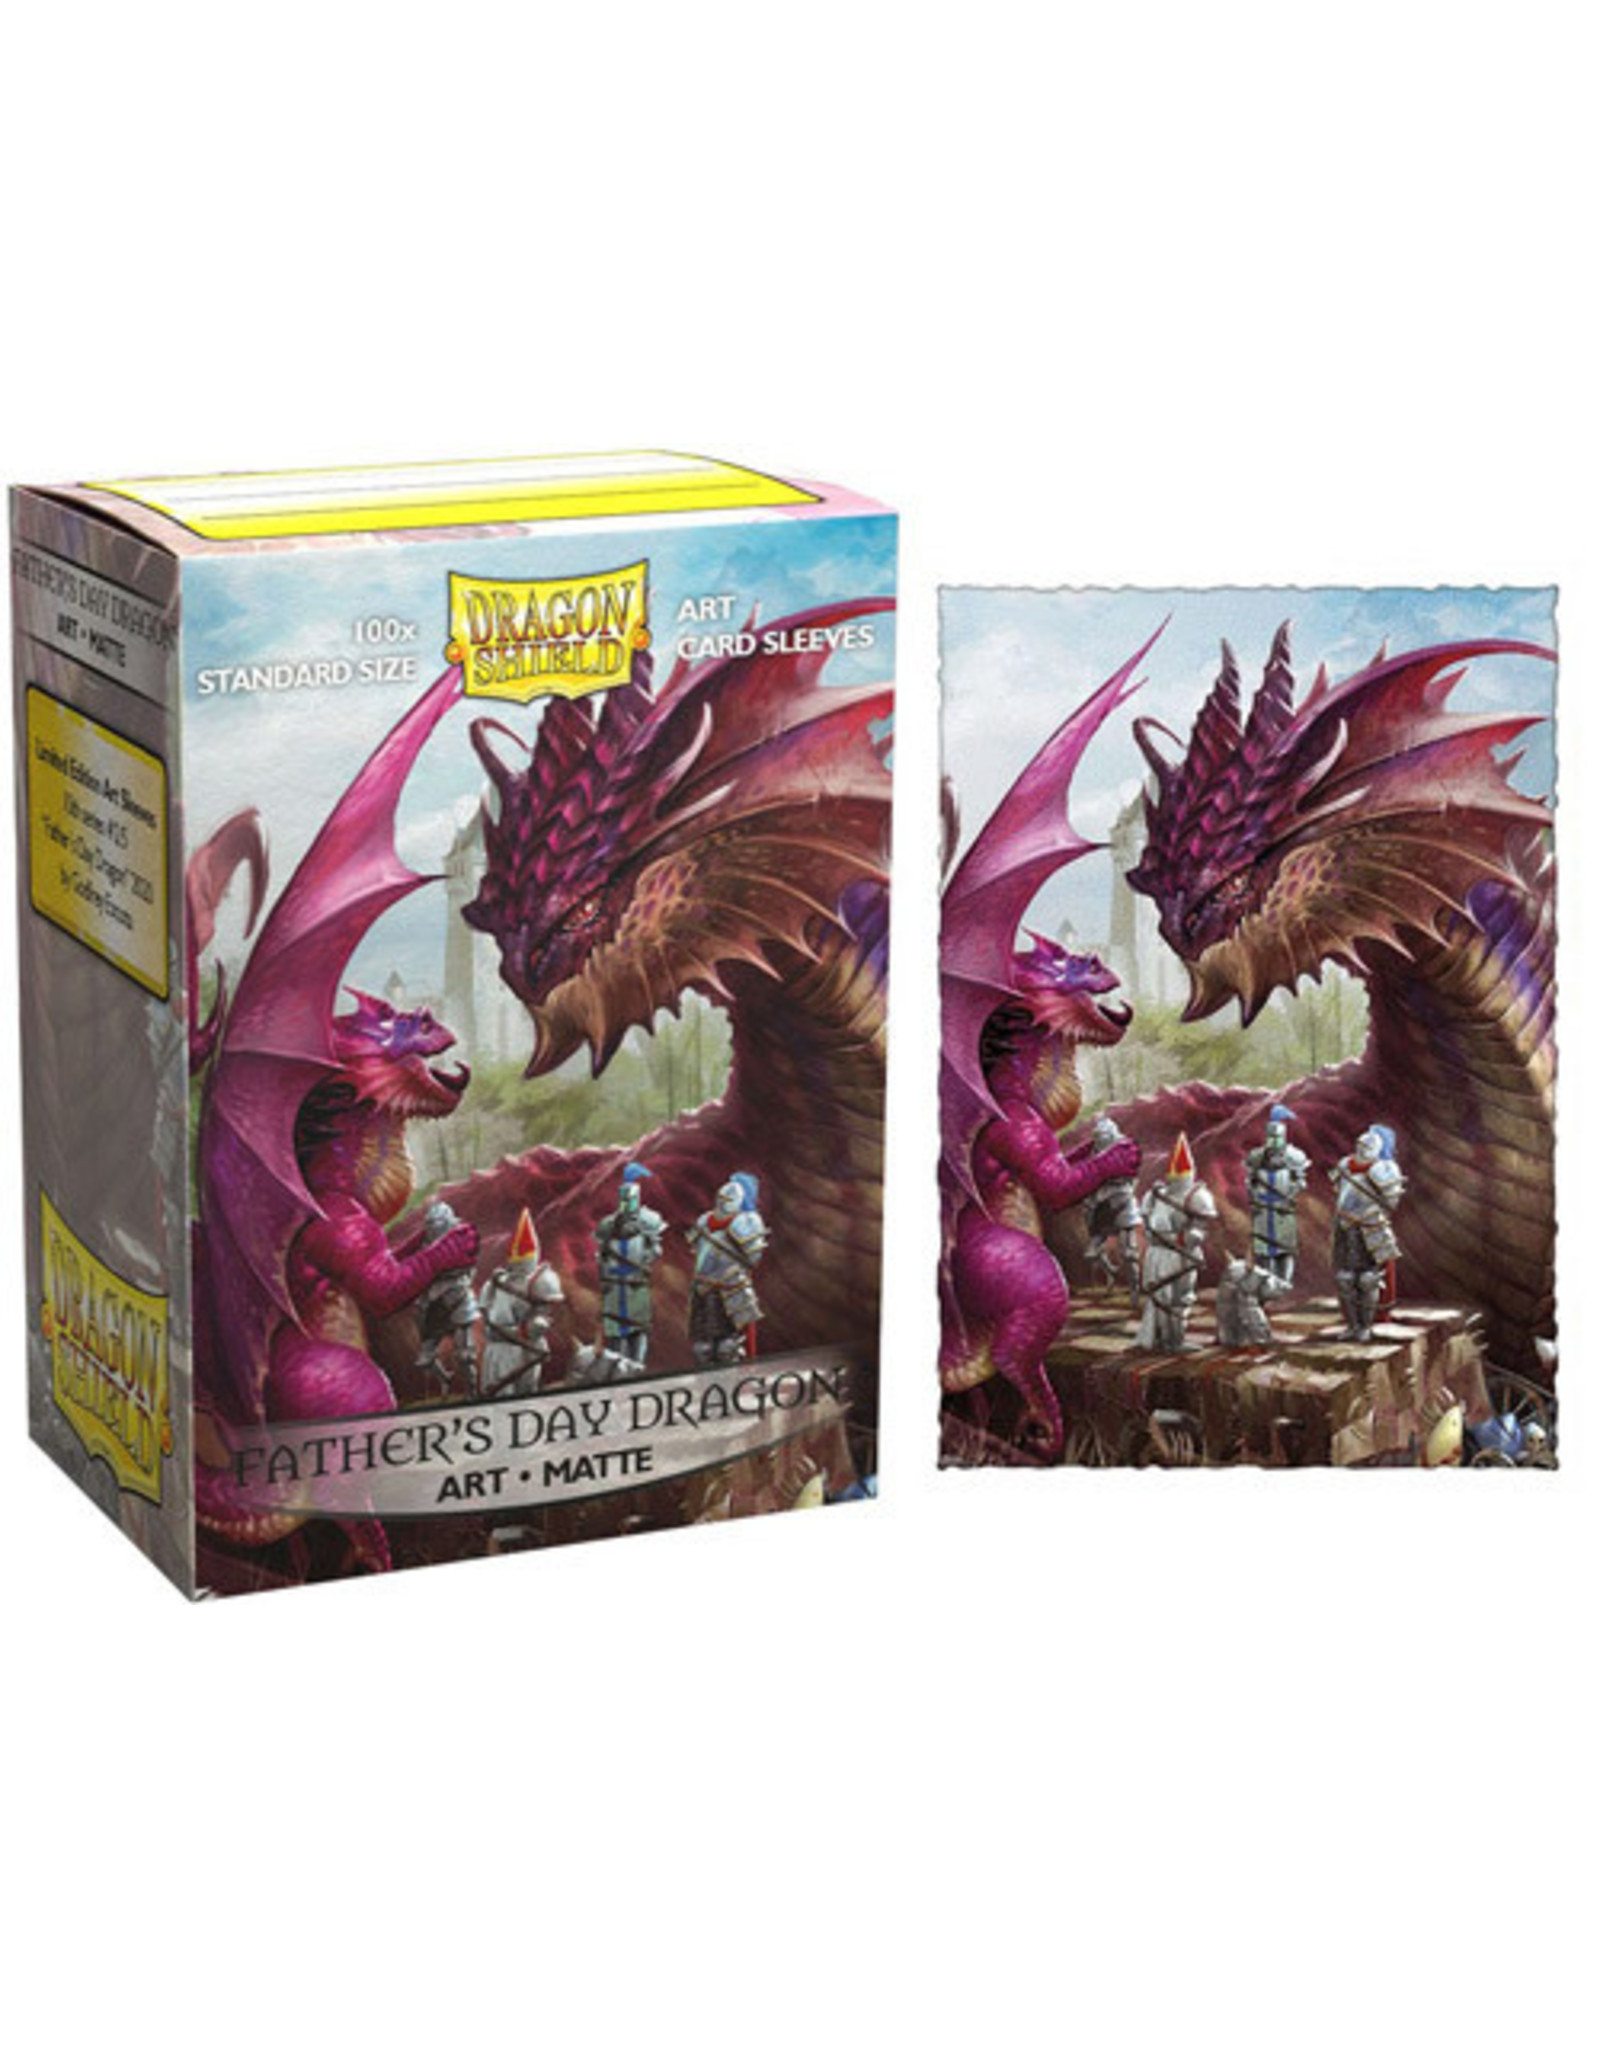 Dragon Shields: (100) Matte Art Sleeves - Father's Day Dragon